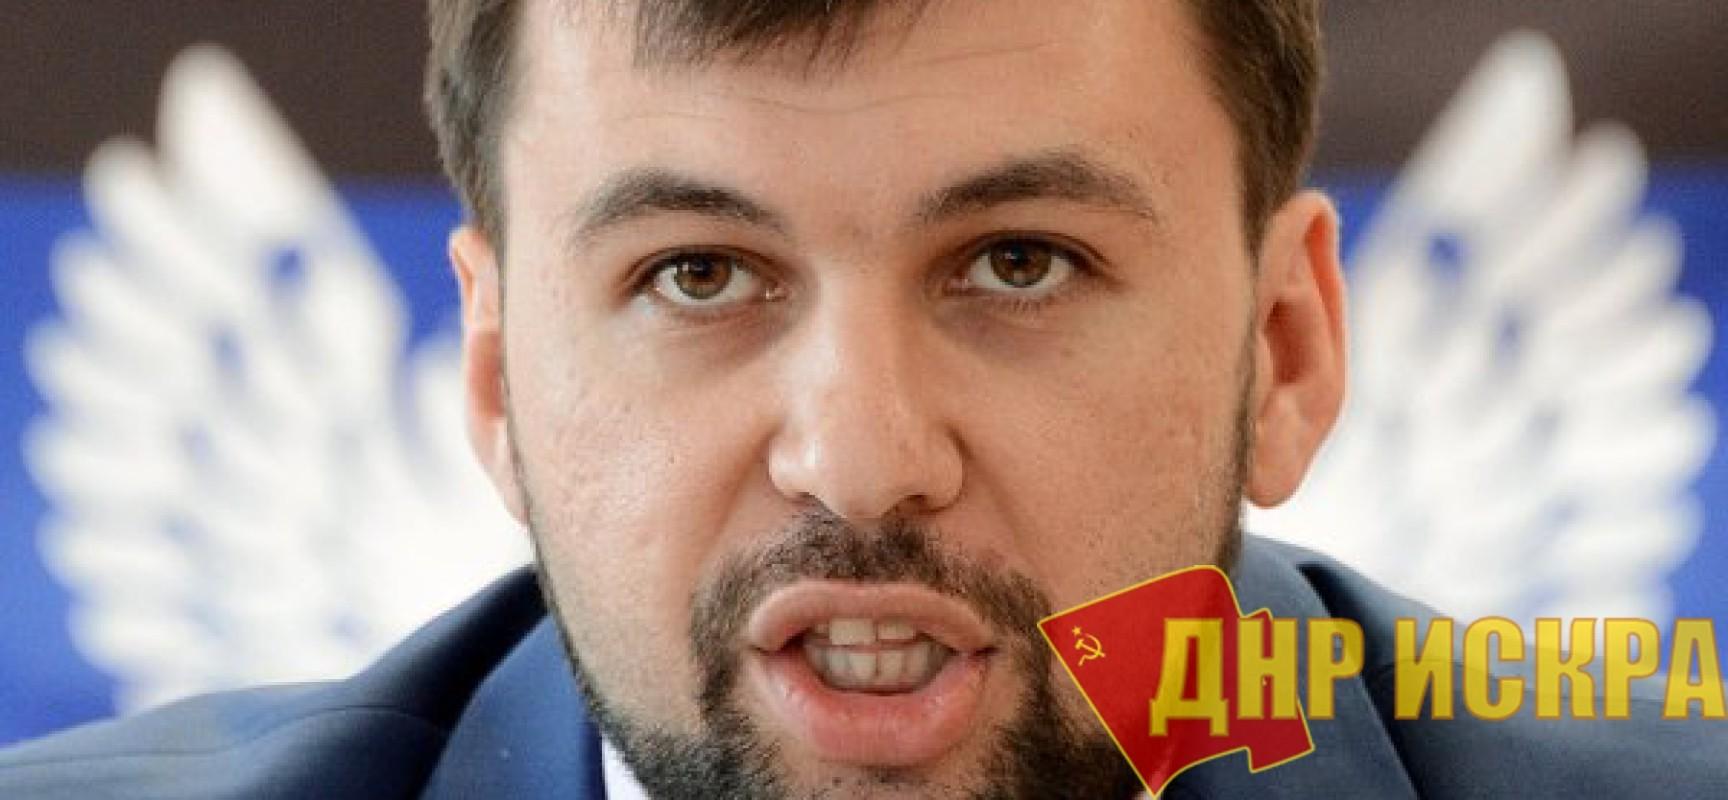 Госпереворот в ДНР. ВРИО Главы ДНР назначен Денис Пушилин